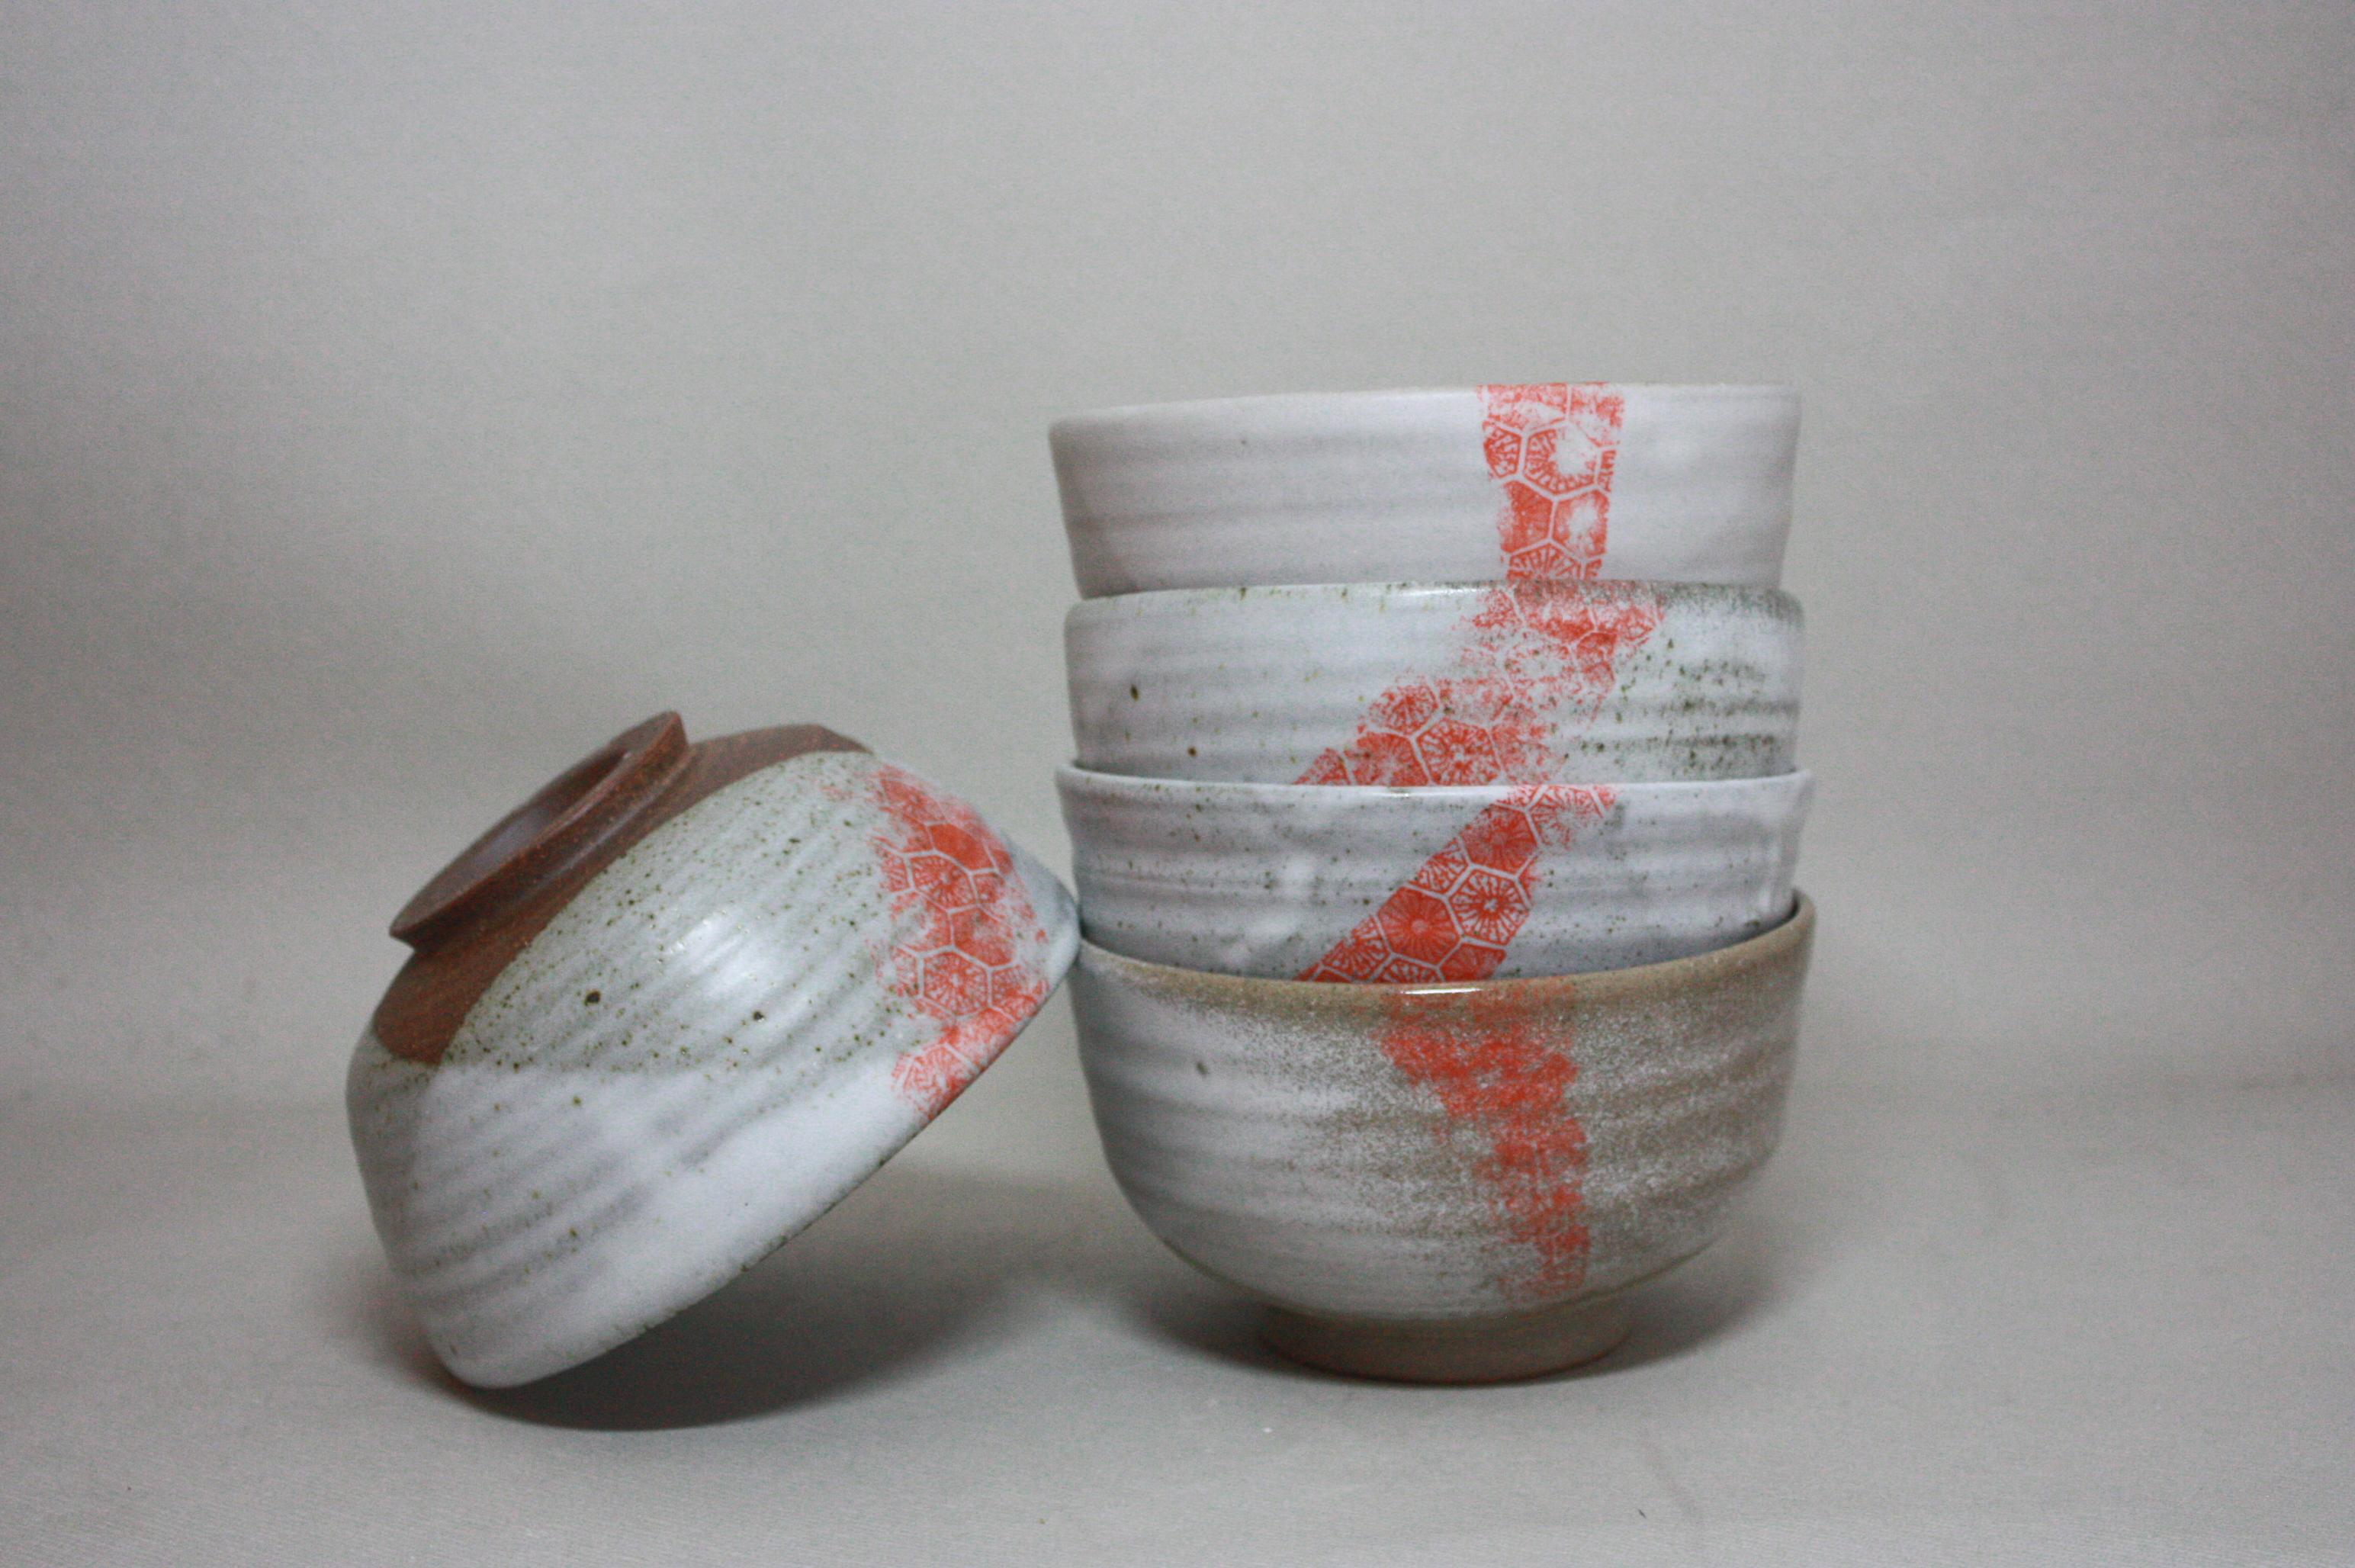 large ramen bowls